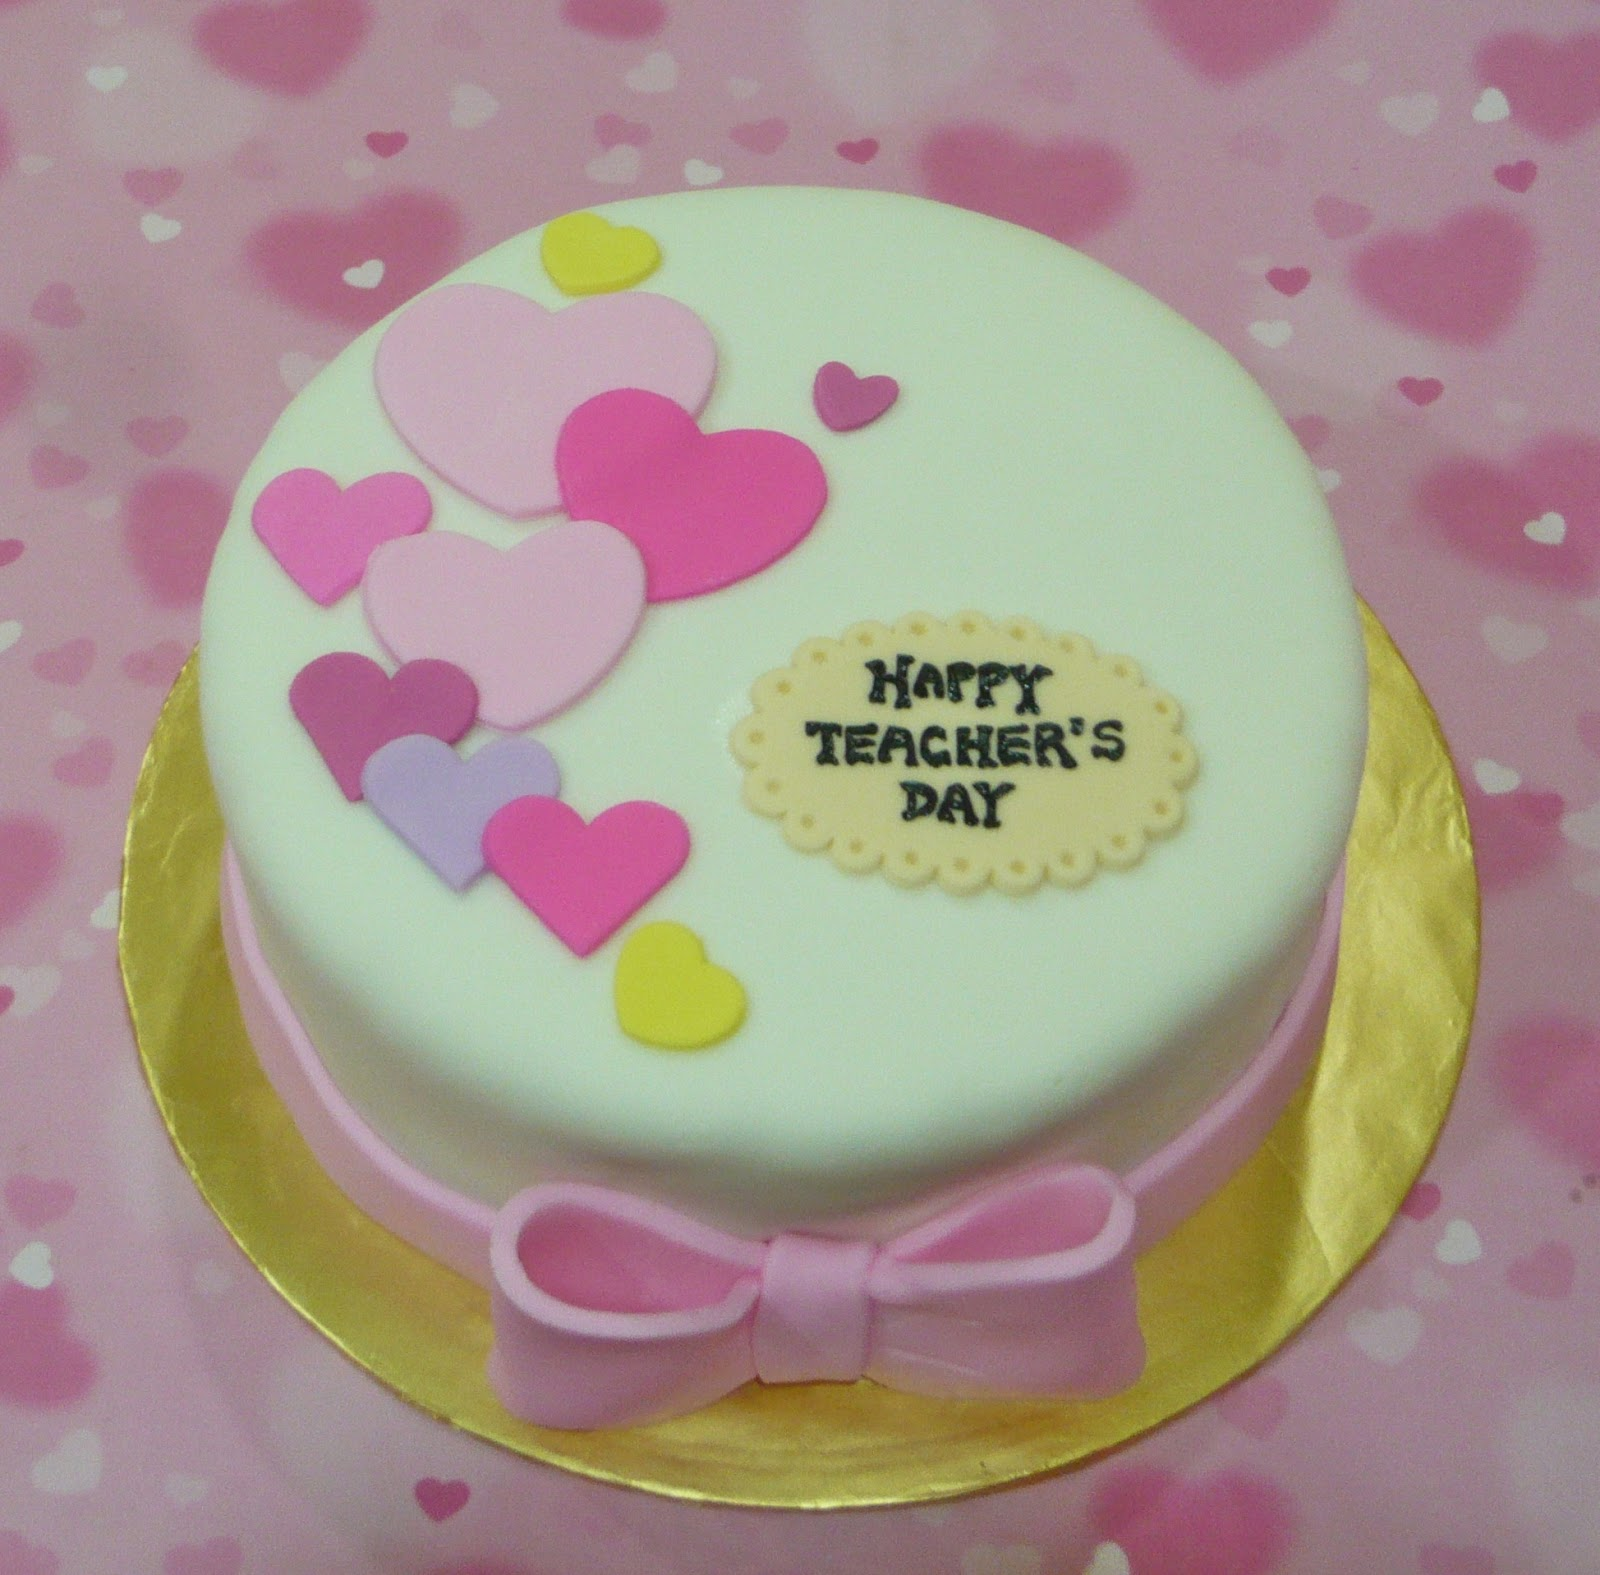 Cake Designs For Teachers Day : Jenn Cupcakes & Muffins: Teacher s Day Cake